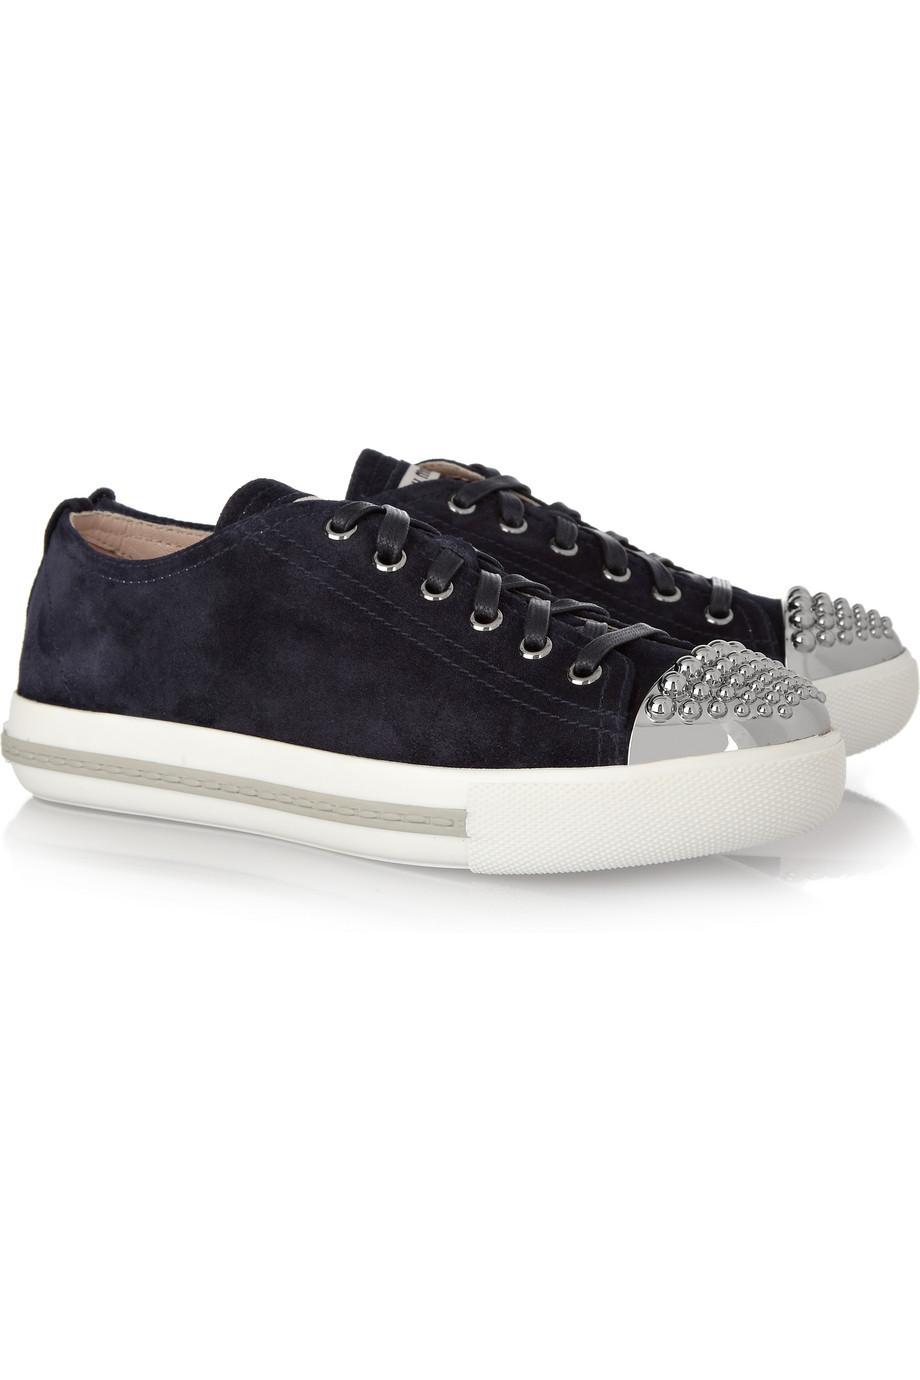 Lyst Miu Miu Studded Suede Sneakers In Blue